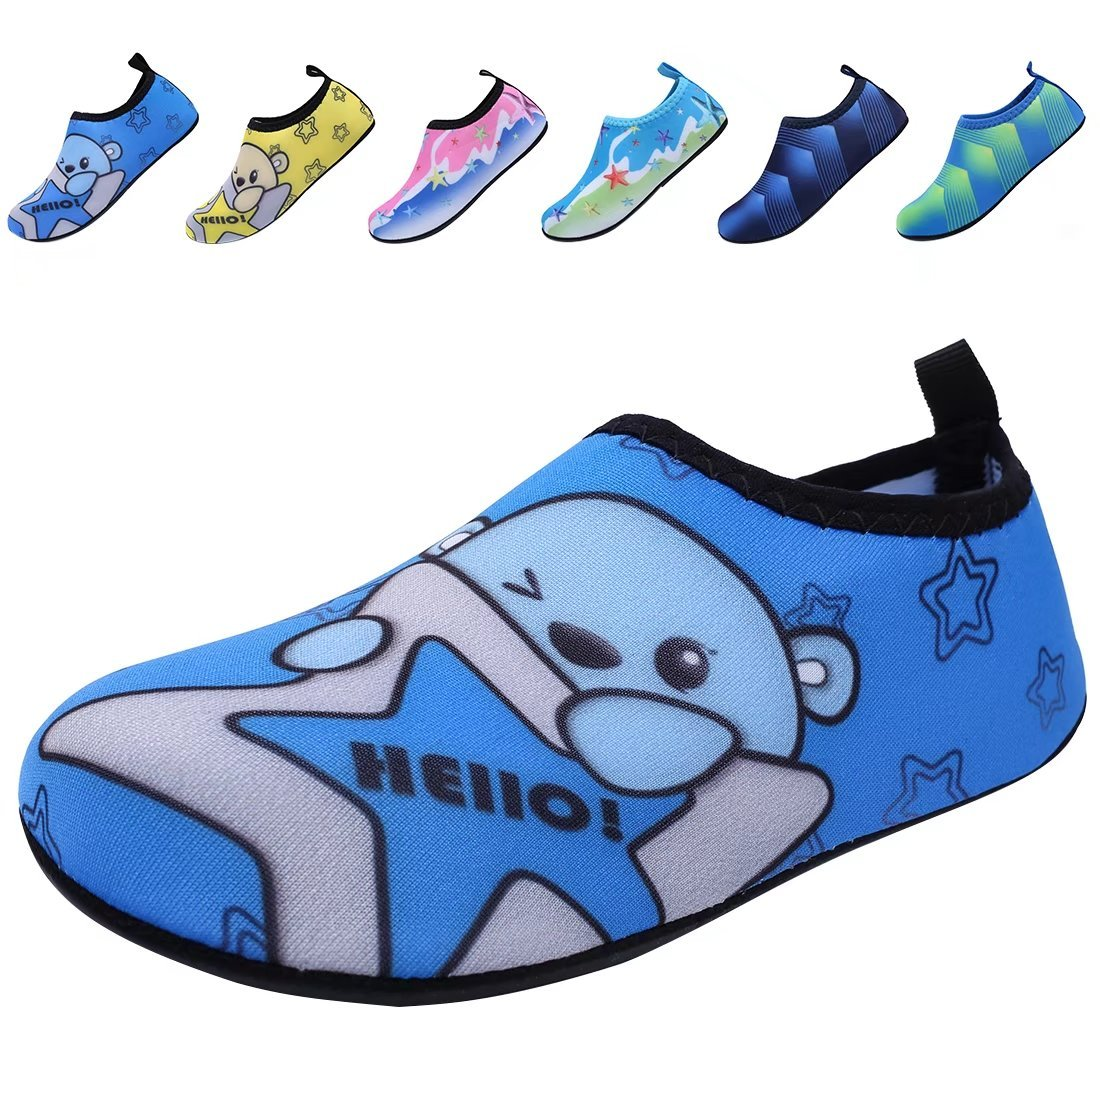 BODATU Boys' Girls' Swim Water Shoes Kids Quick Dry Barefoot Aqua Sock Shoes for Beach Pool K50